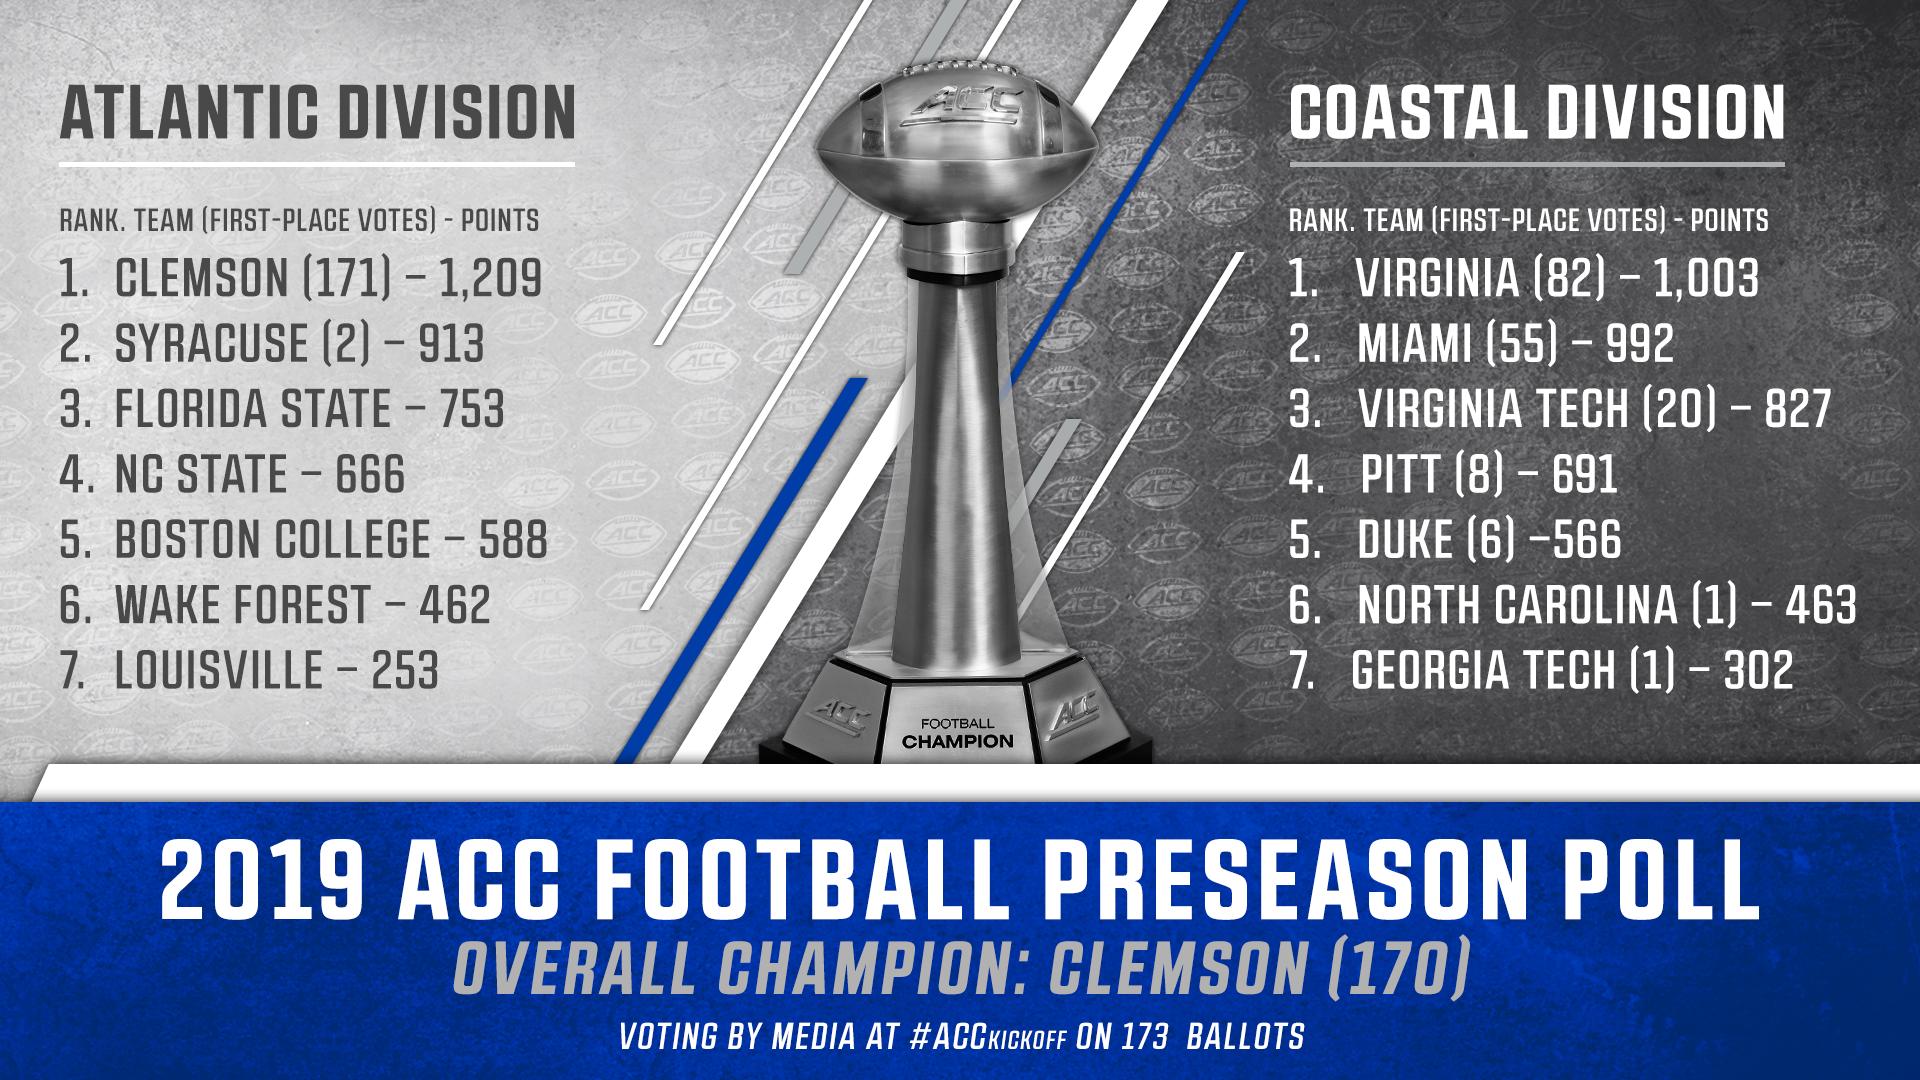 2019 acc football preseason predictions